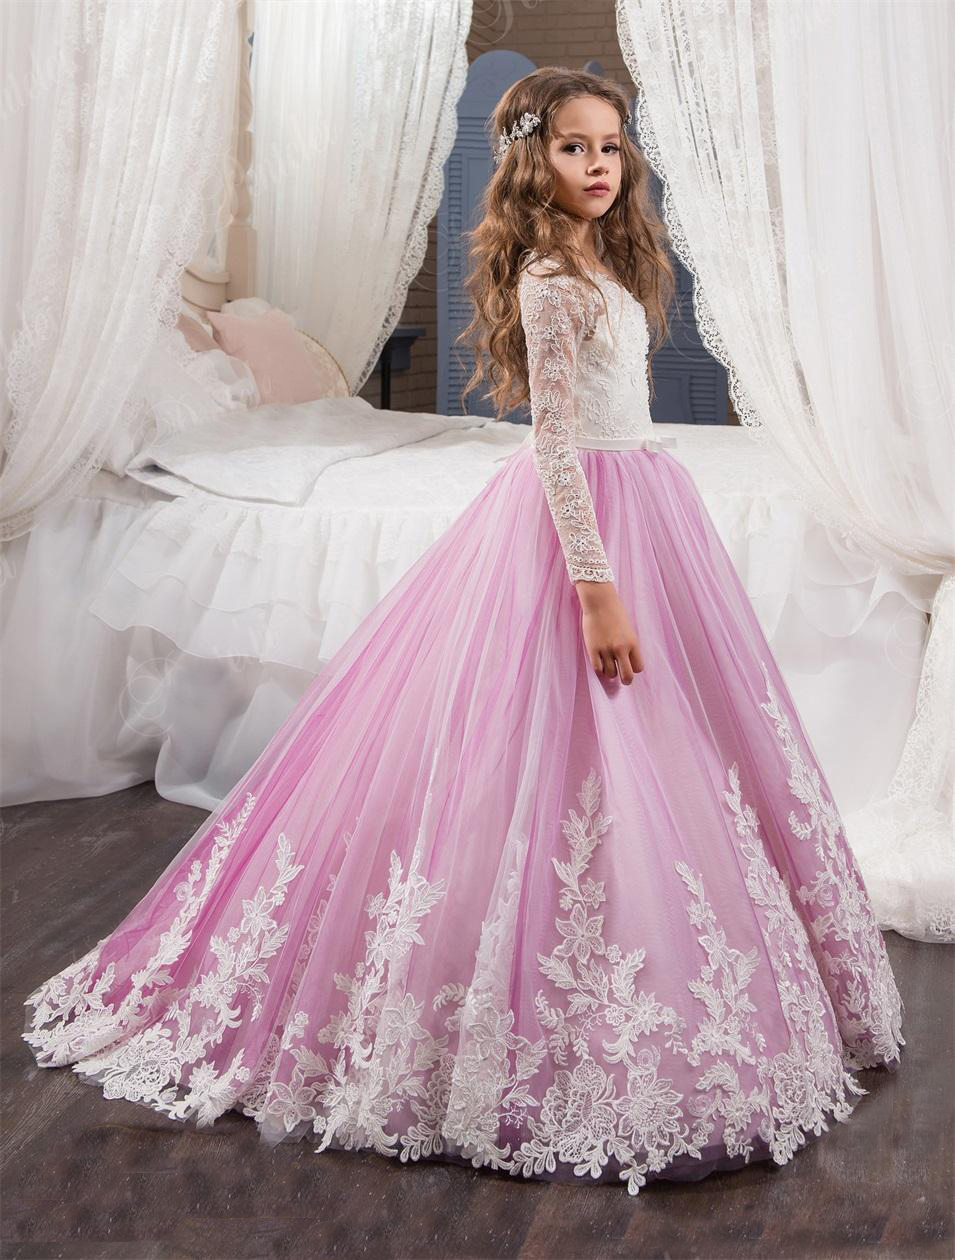 Lila Niñas Coummunion Vestido de Manga Larga Vestidos de Niña de ...